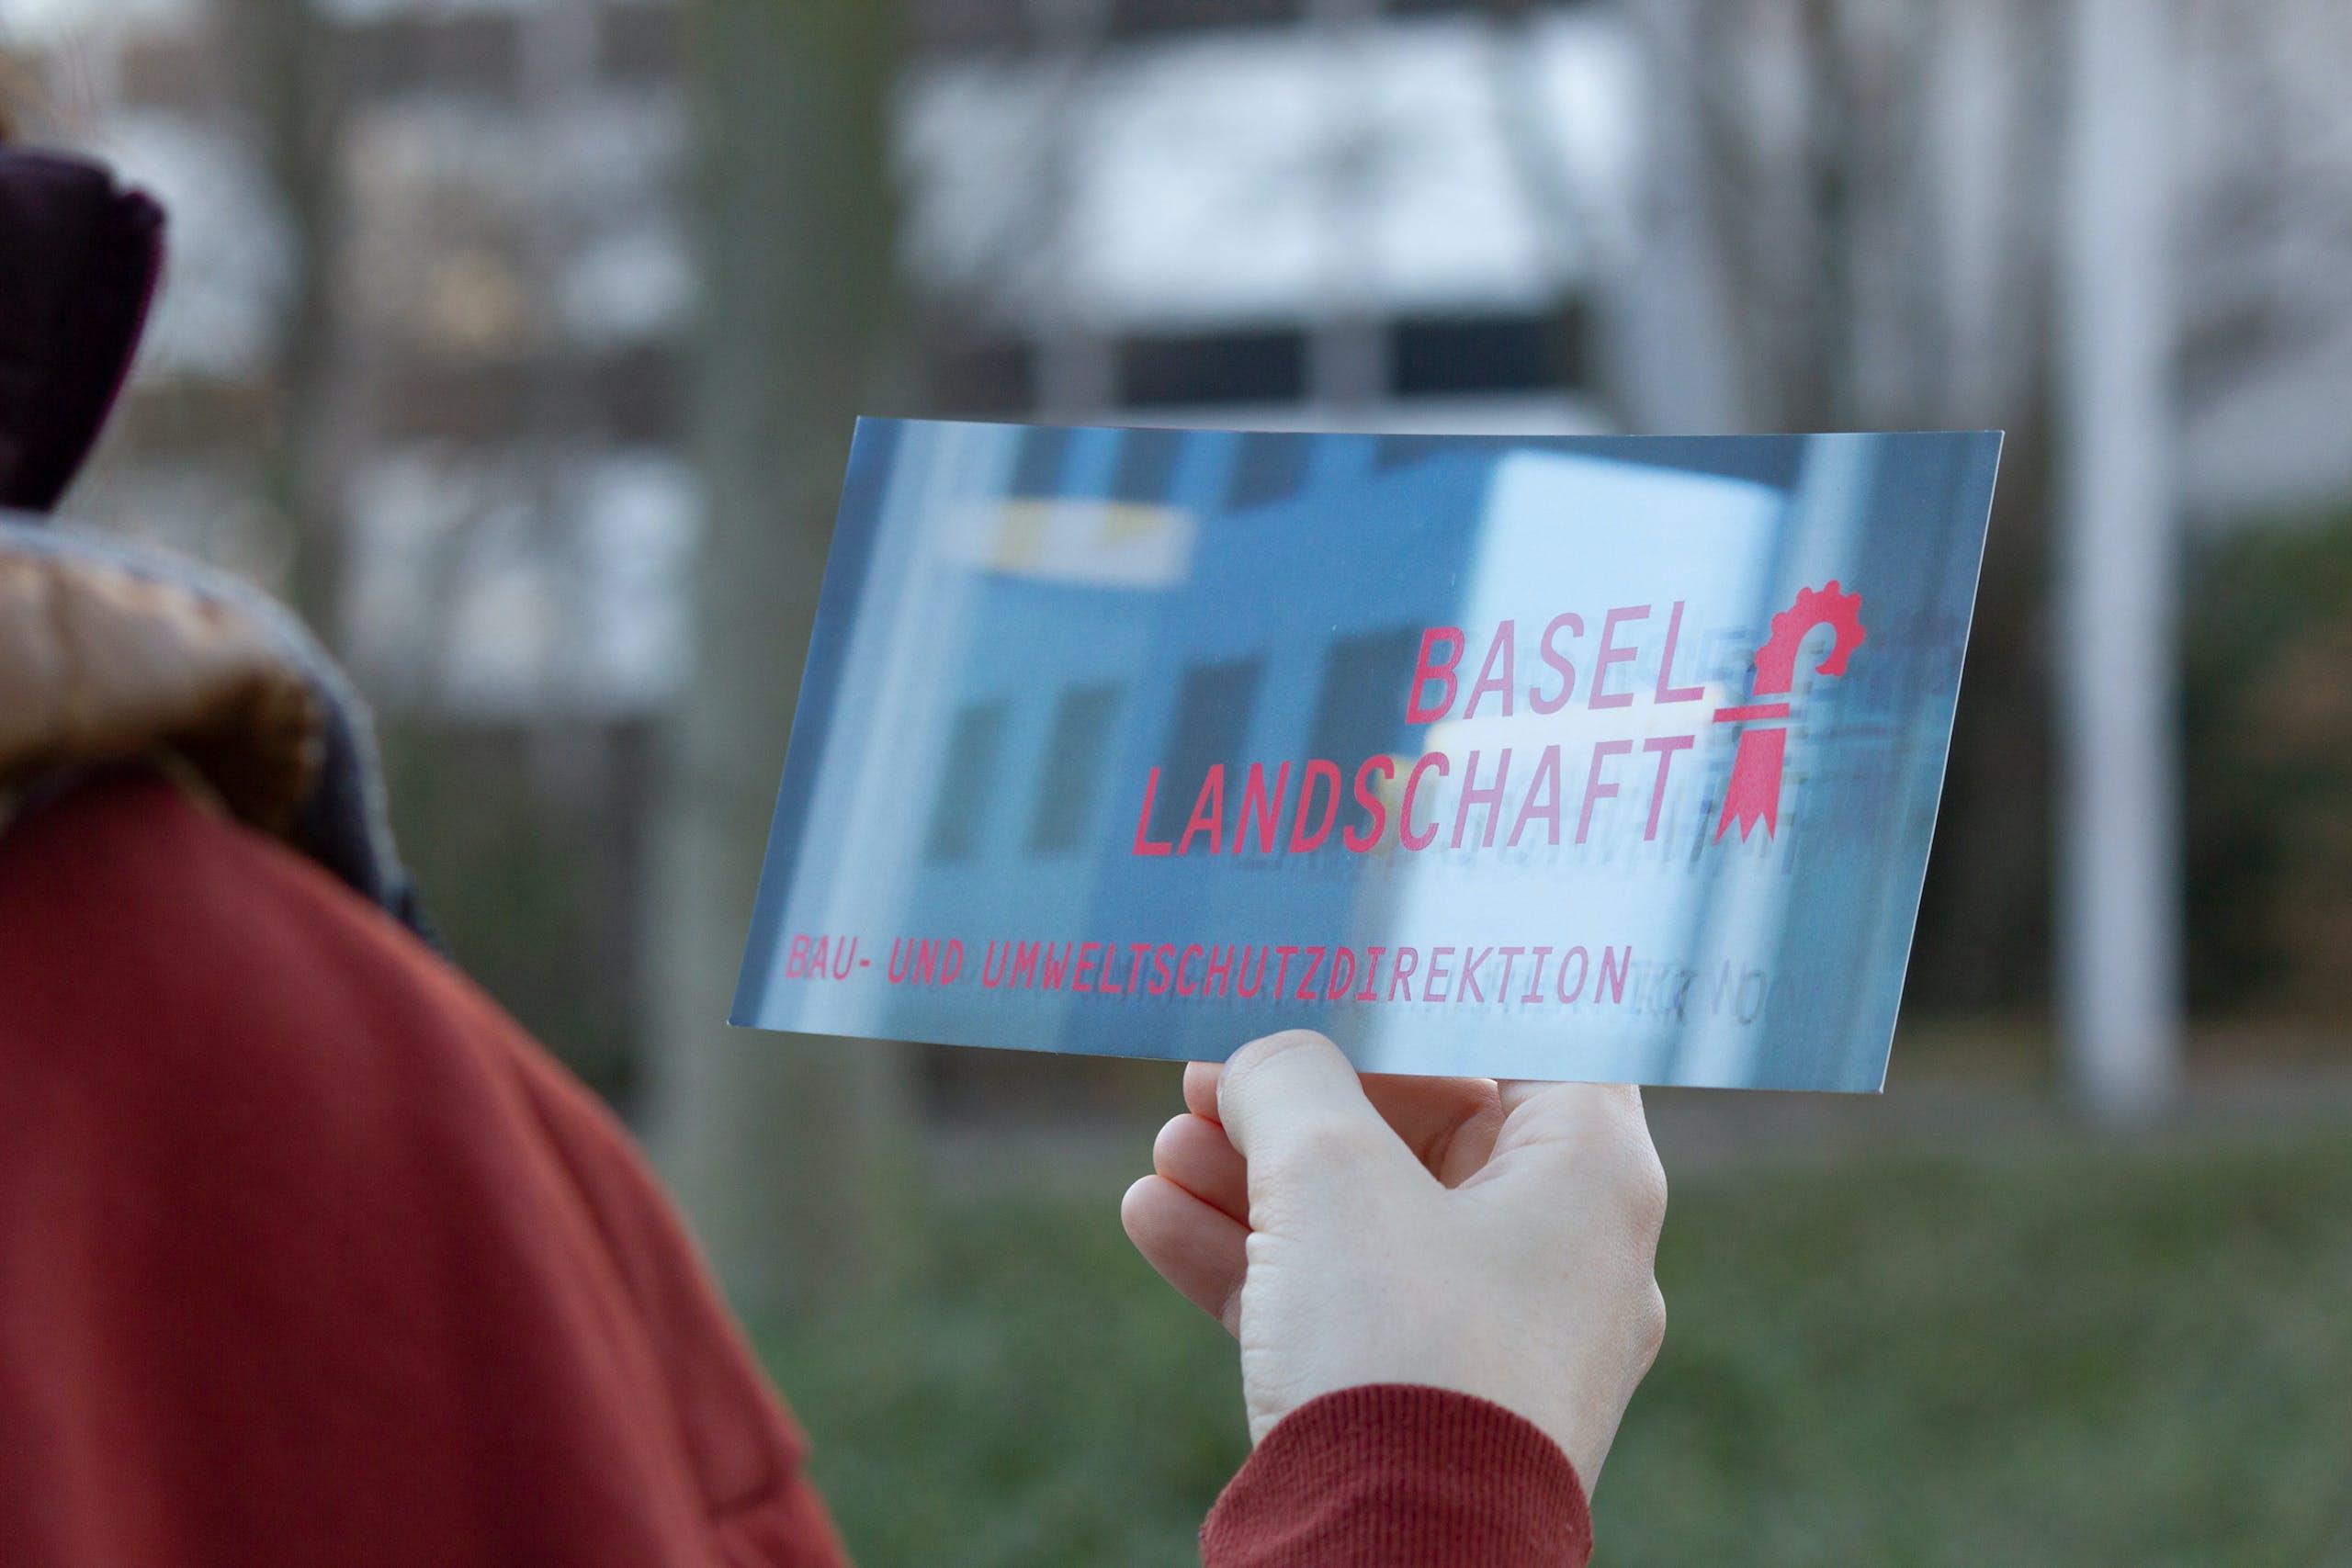 Cedric Kegreiss, Postkarten, Fotografie, Karten, Grafik-Design, Basel, Design, Kommunikation, Visuelle Gestaltung